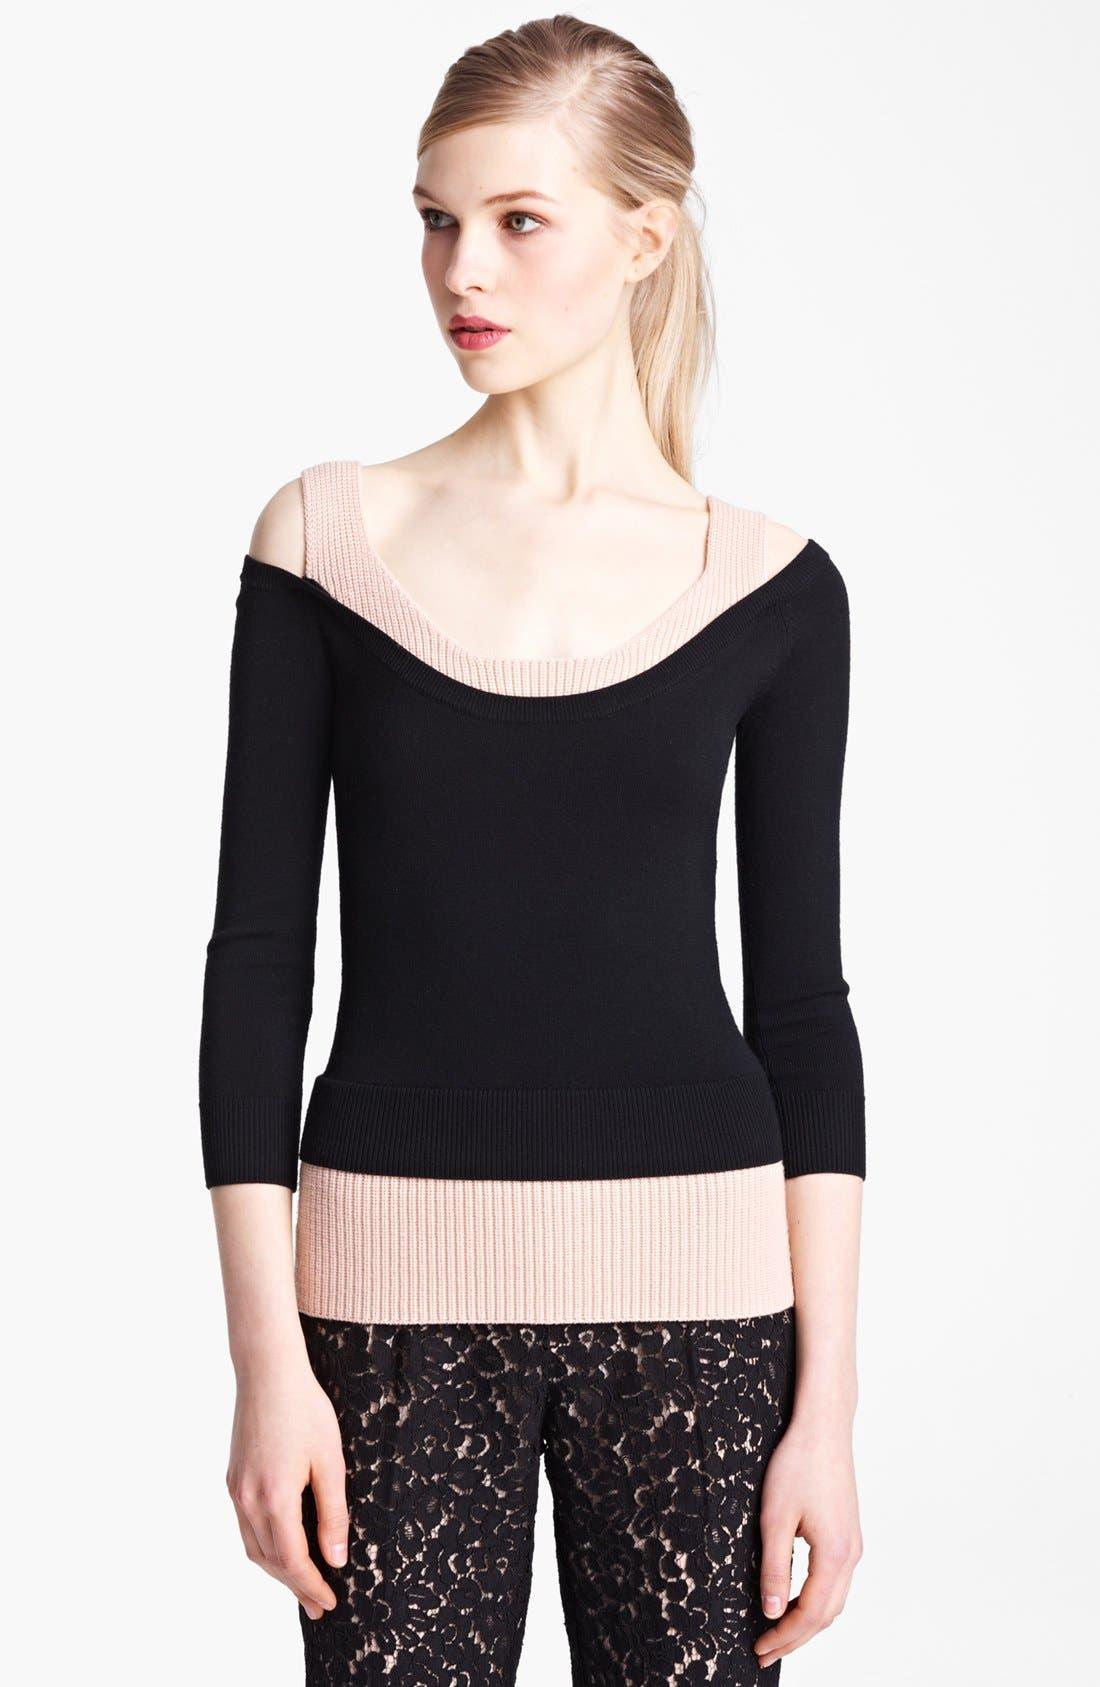 Alternate Image 1 Selected - Michael Kors Layered Merino Wool Sweater